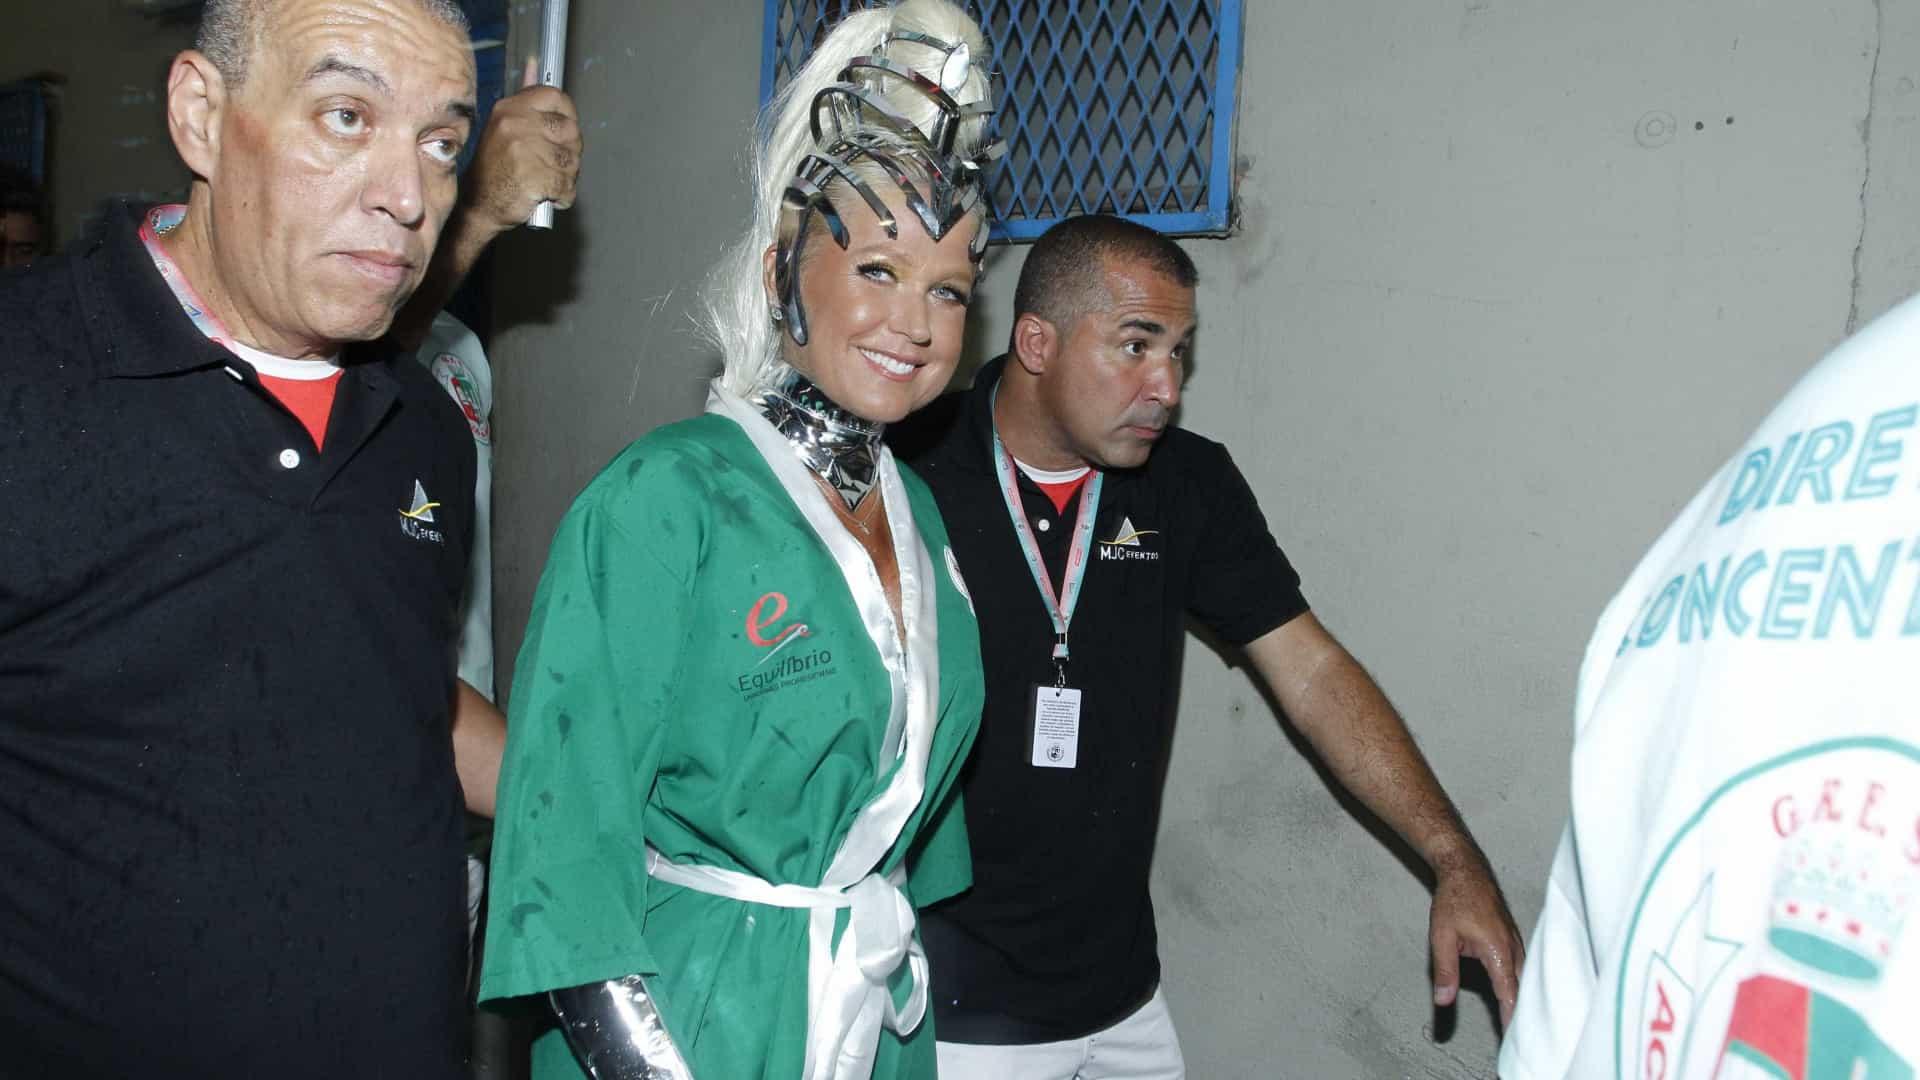 naom 58b5780d64237 - Xuxa diz que gostaria de cantar 'Lua de Cristal' em ritmo de Carnaval